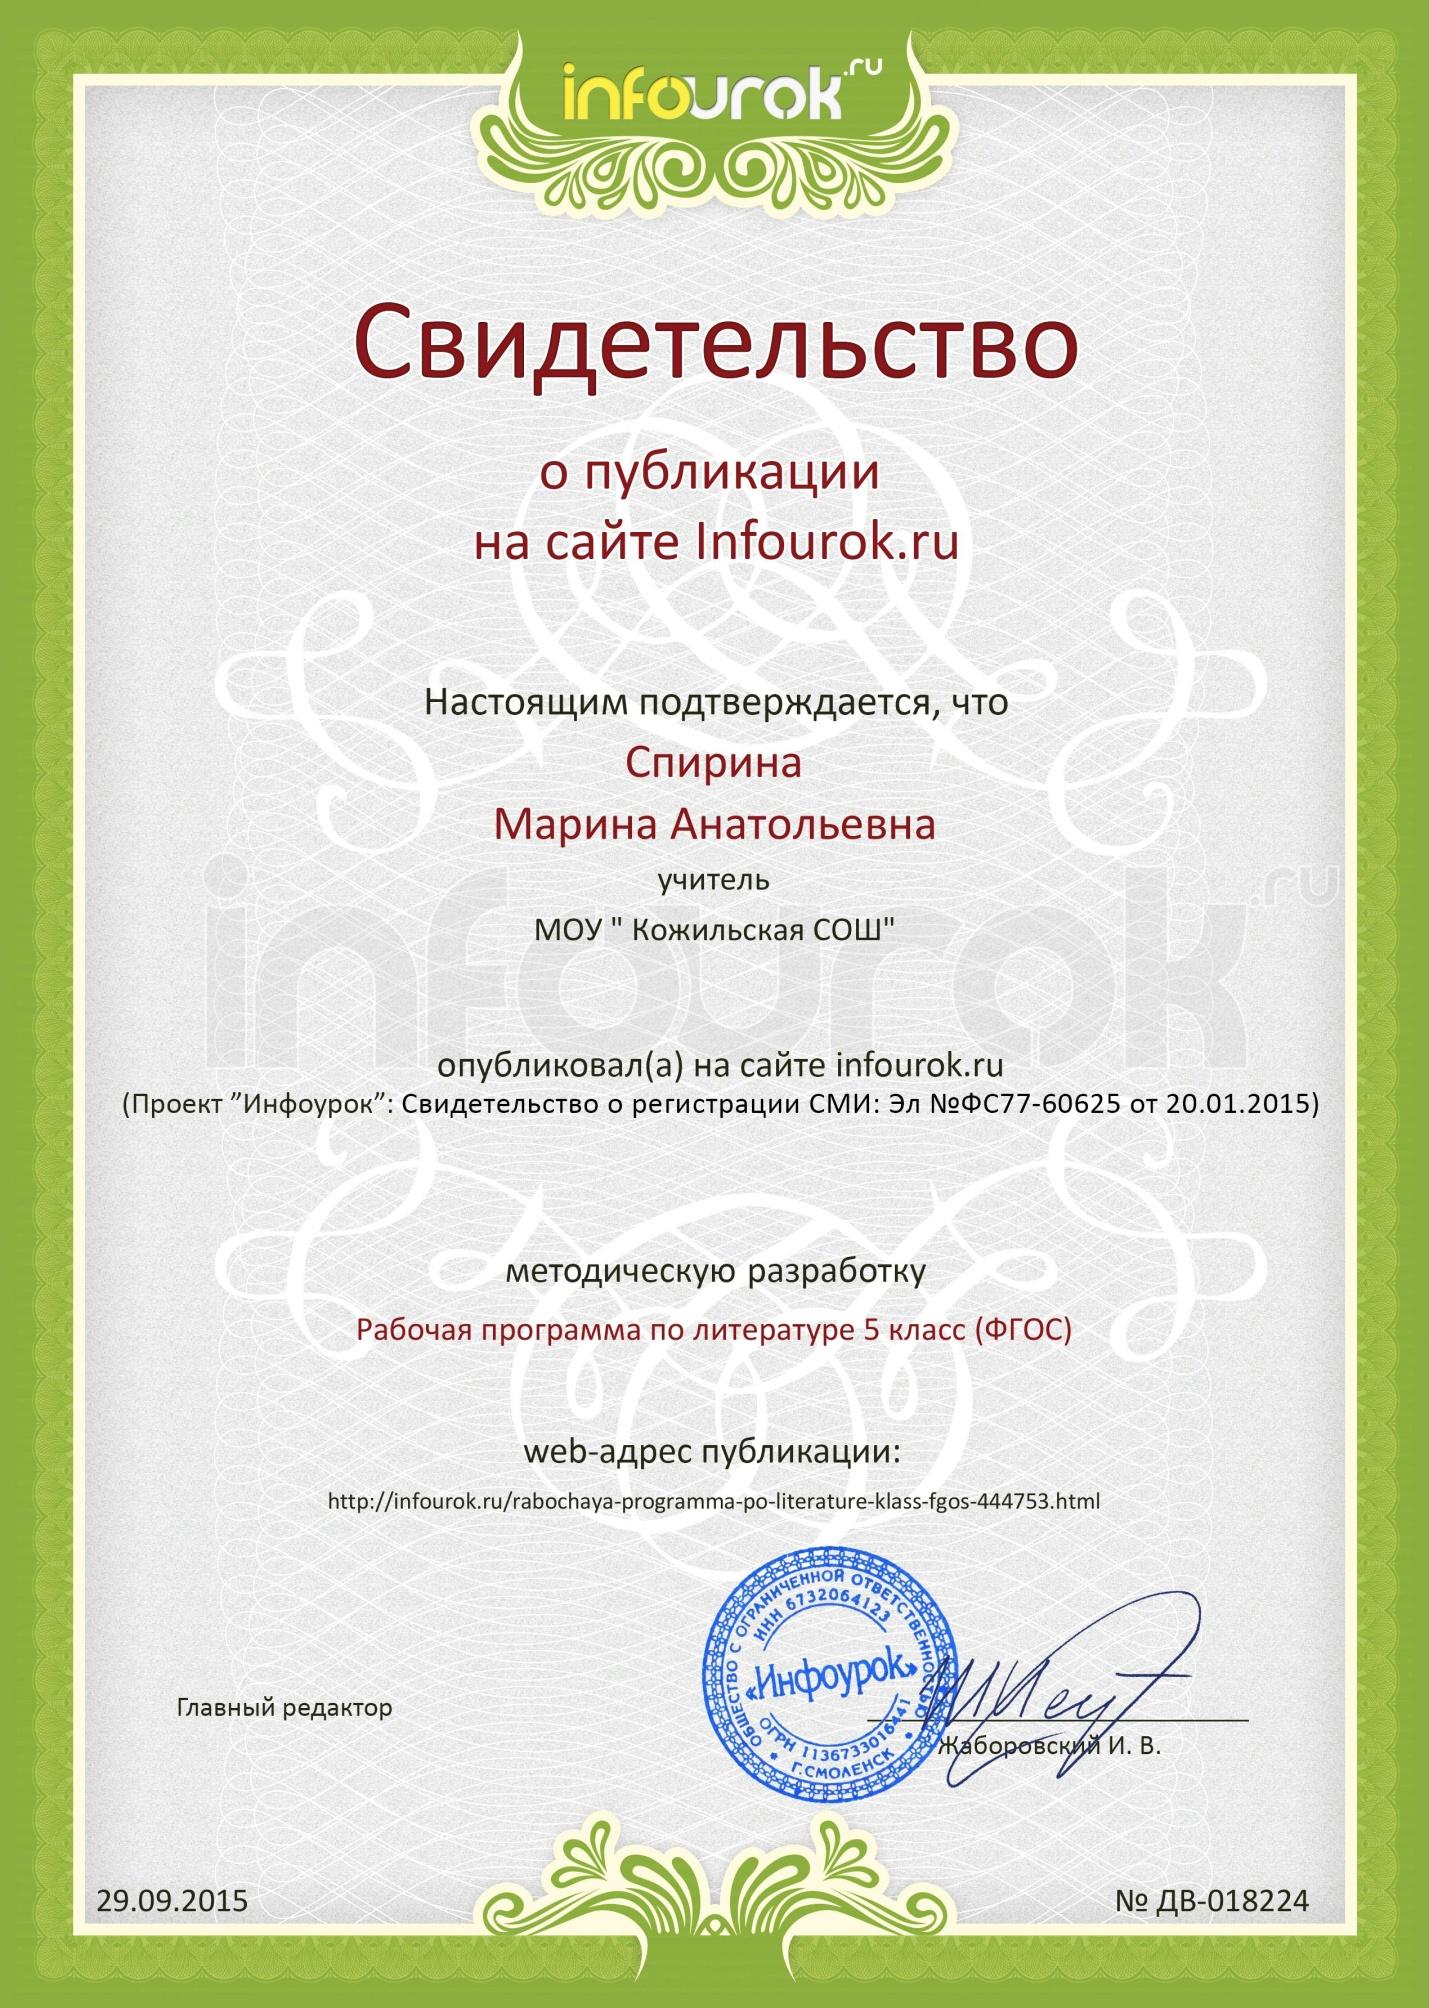 C:\Users\user\Downloads\Сертификат проекта Infourok.ru № ДВ-018224.jpg